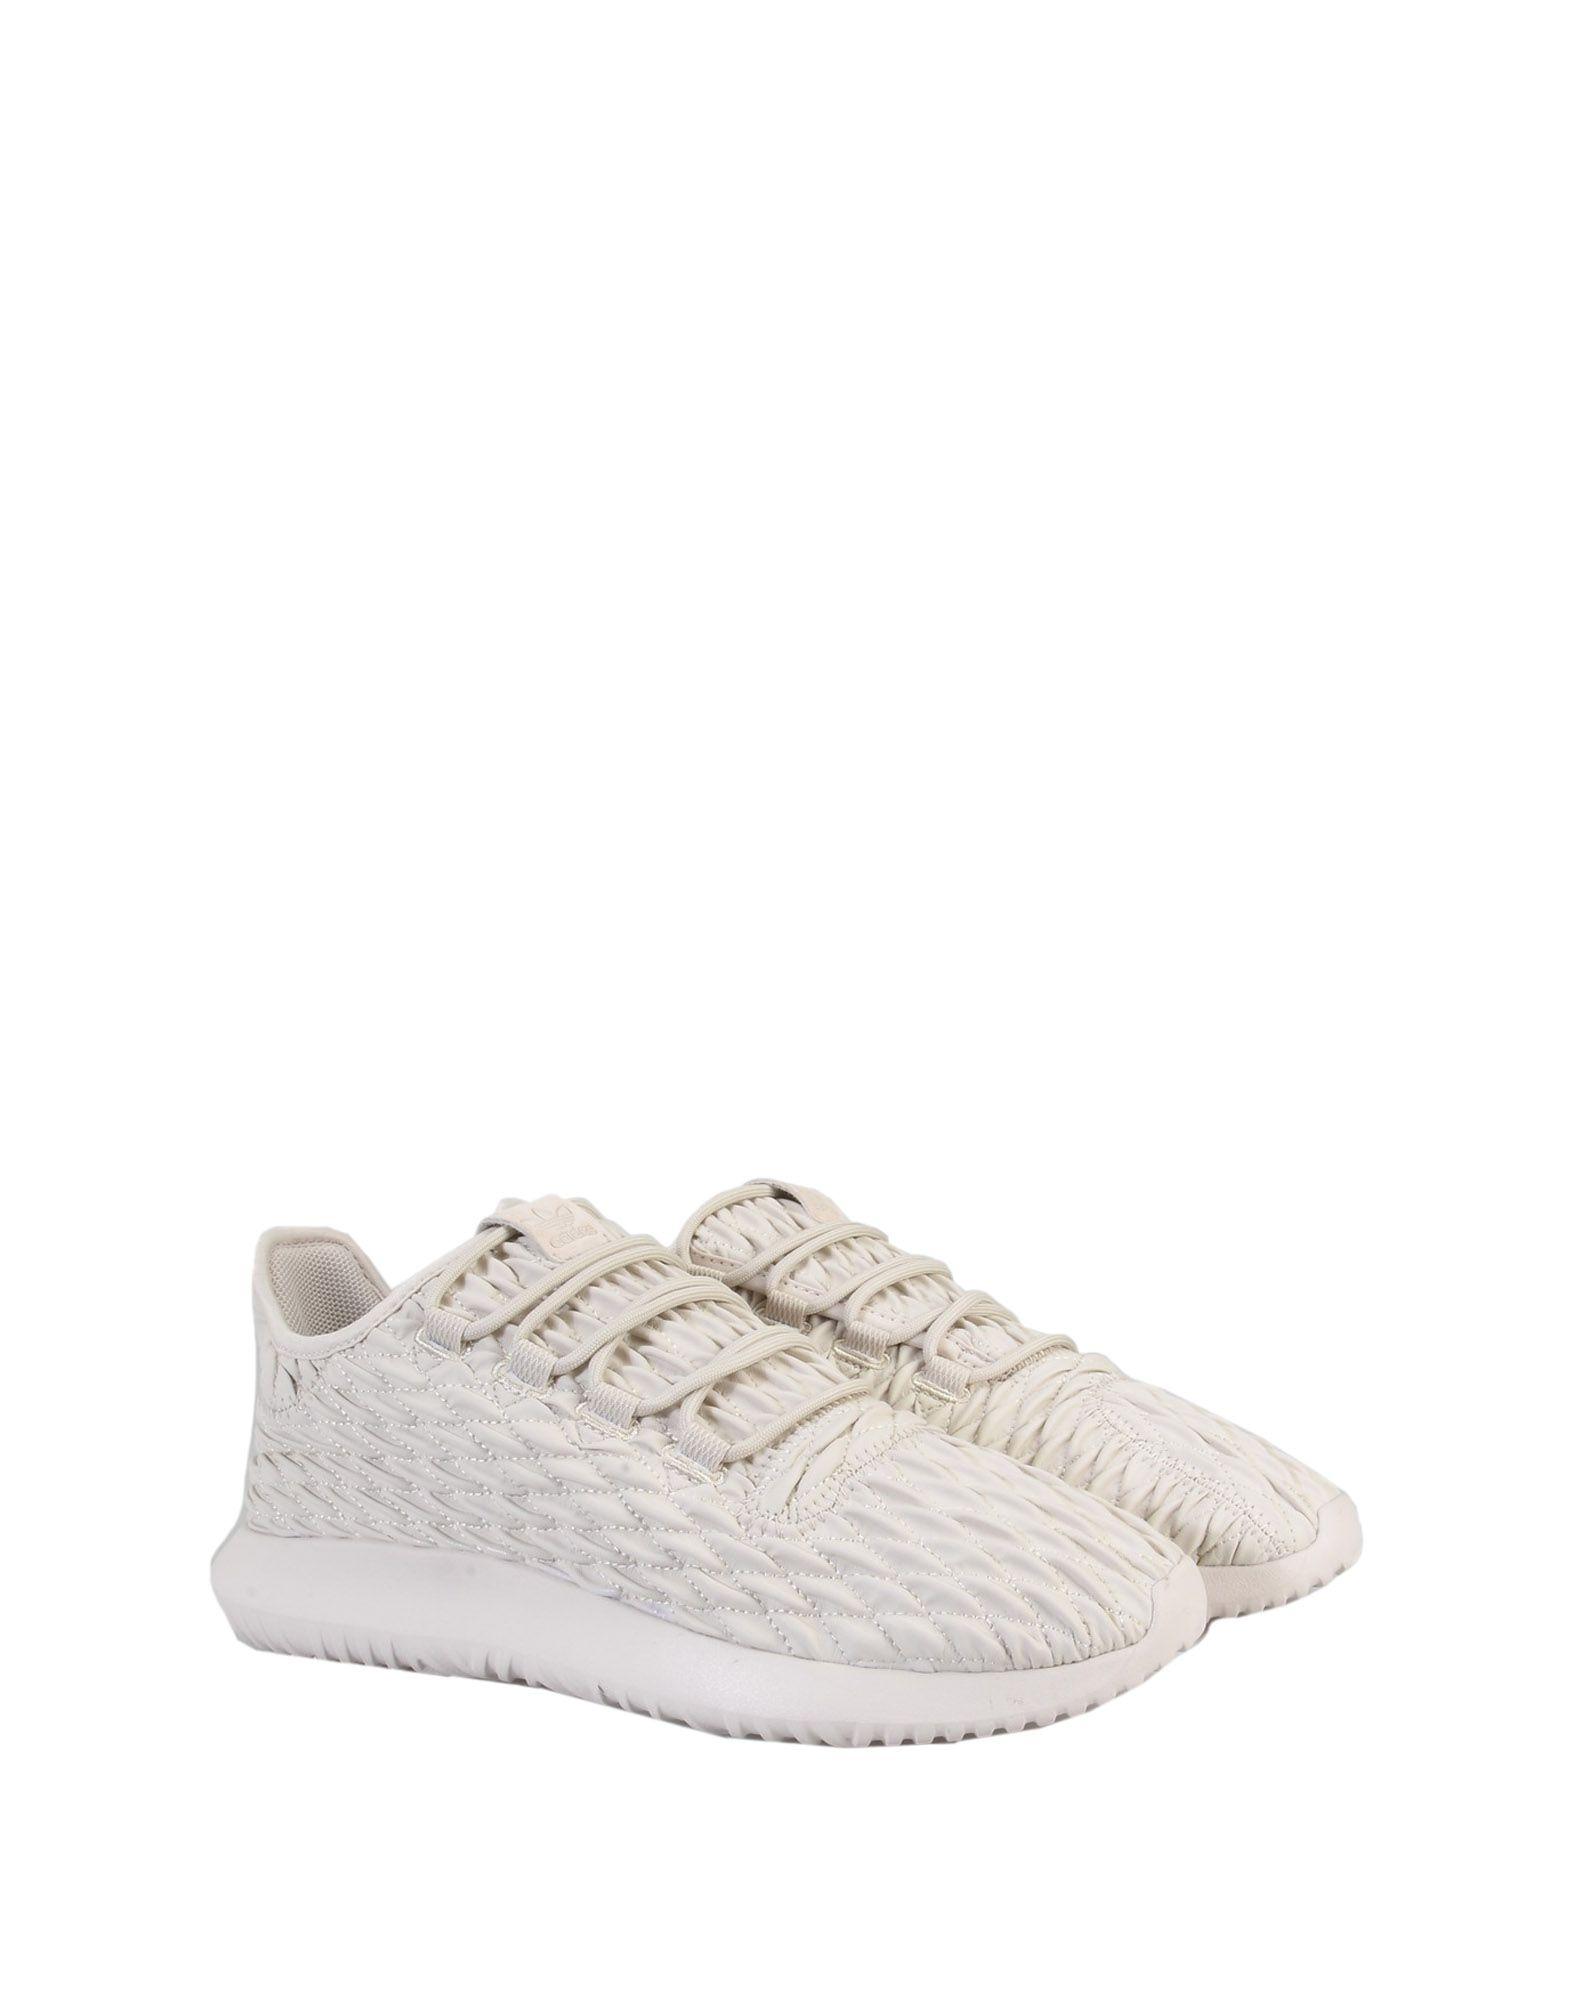 Sneakers Tubular Adidas Originals Tubular Sneakers Shadow - Uomo - 11263248SC ec0c5c